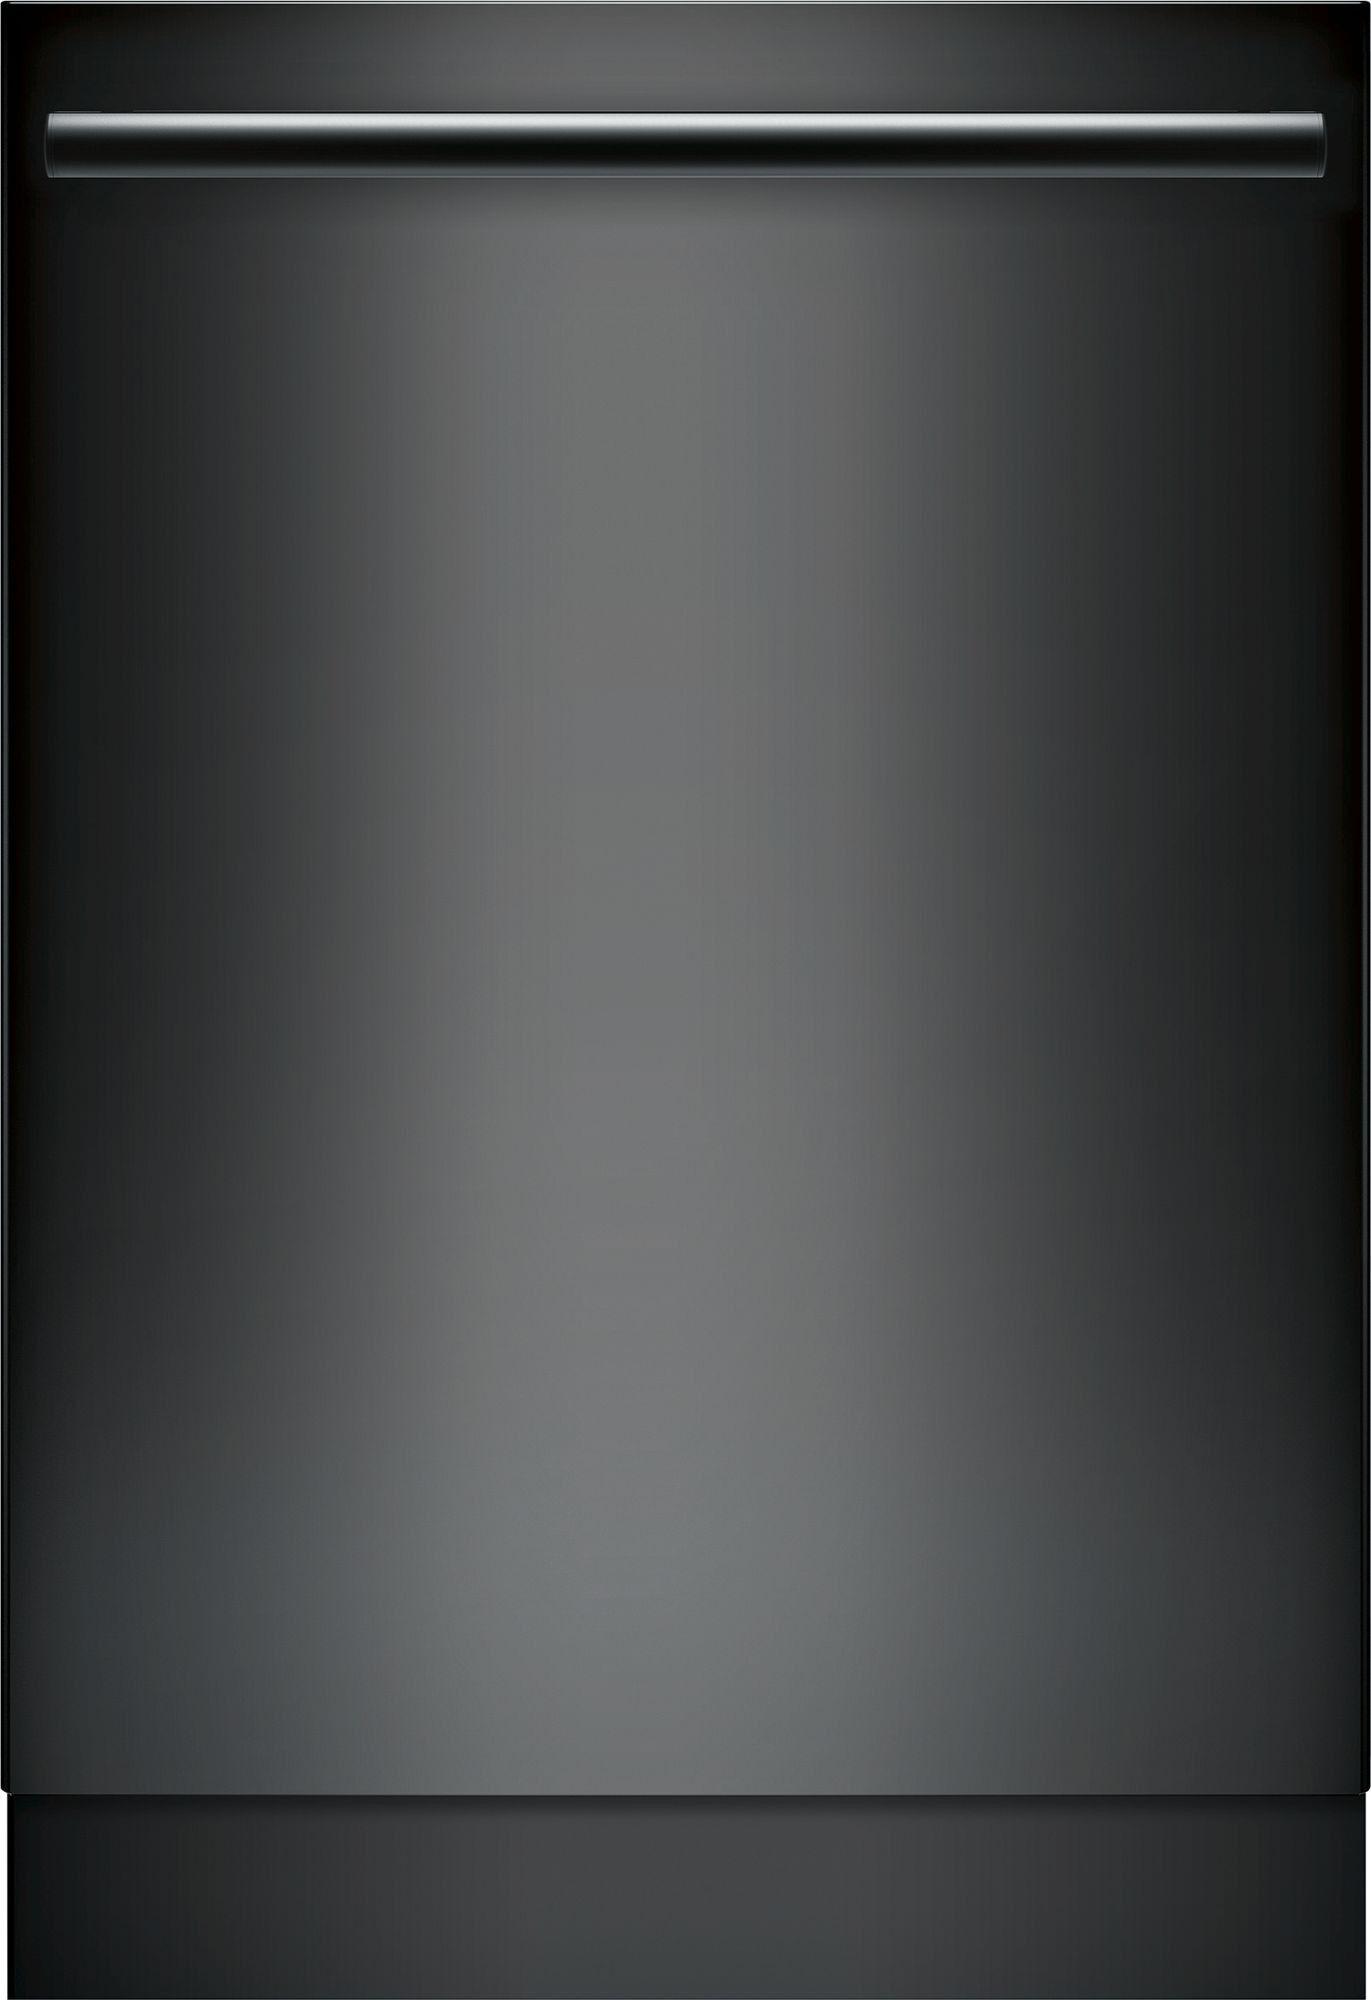 Bosch 800 24 Tall Tub Dishwasher Black Shxm78z56n Built In Dishwasher Black Dishwasher Steel Tub